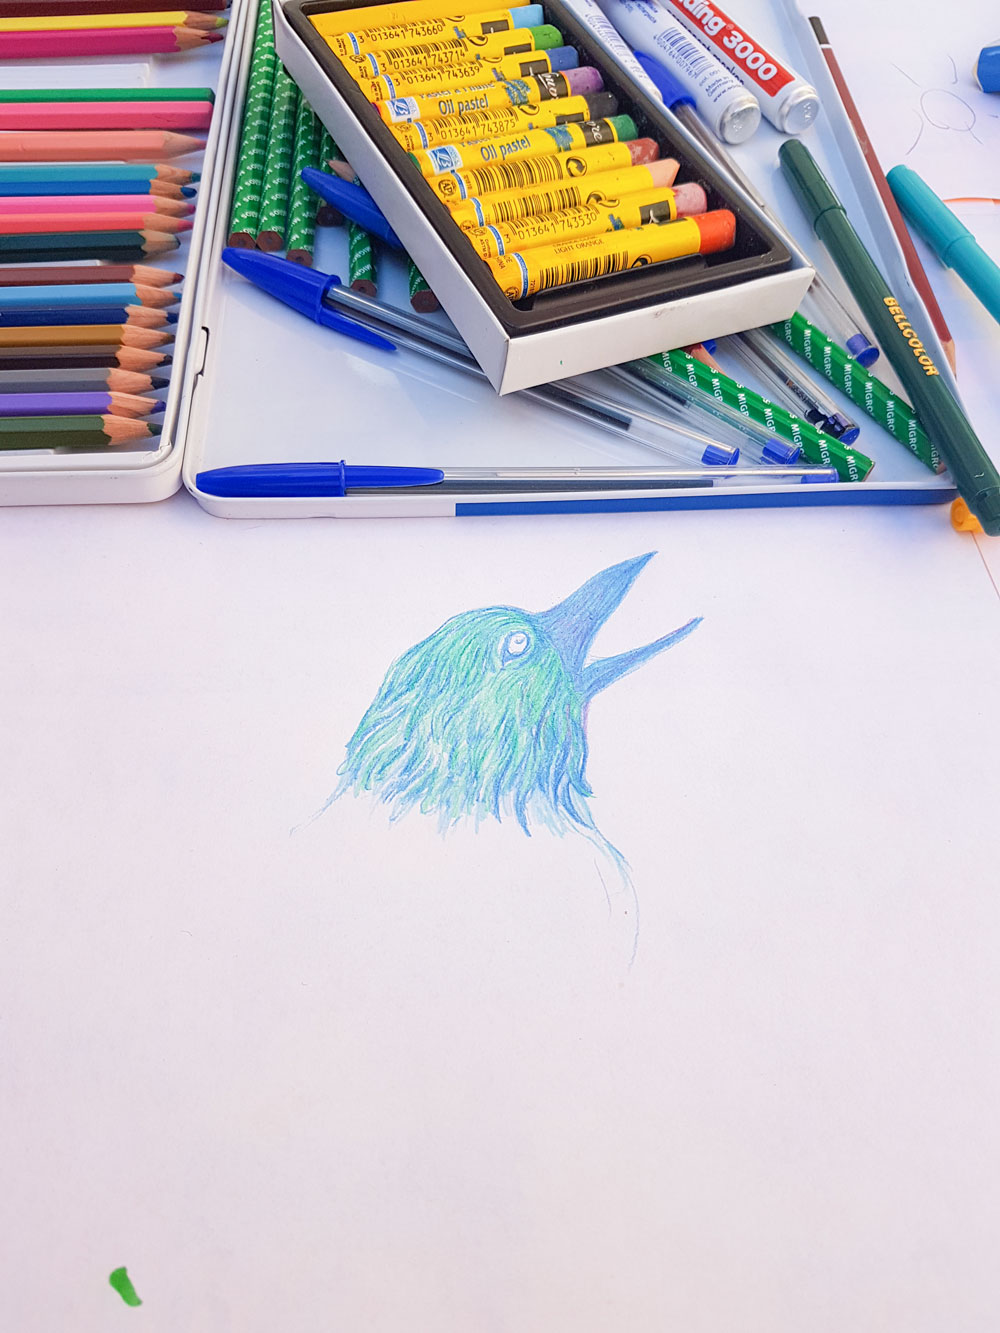 Marcelle-collectif-les-oiseaux-drink-n-draw_10.jpg